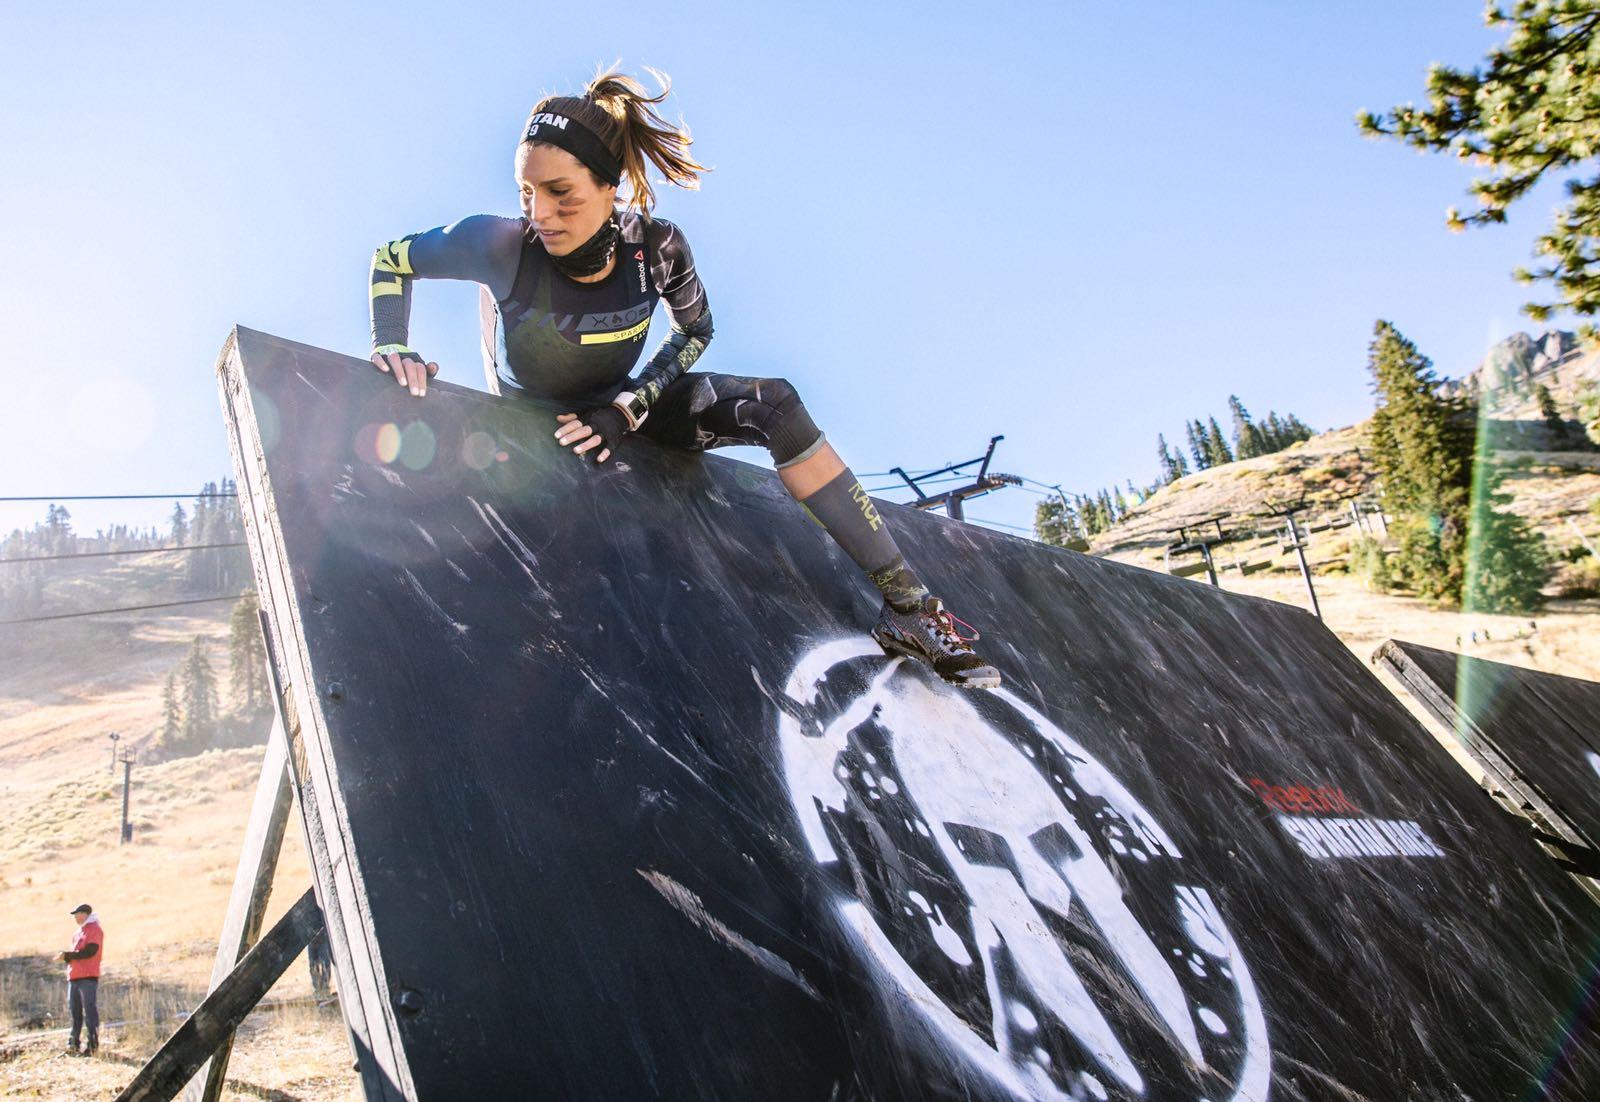 laury-thilleman-lake-tahoe-spartan-race-011016-03